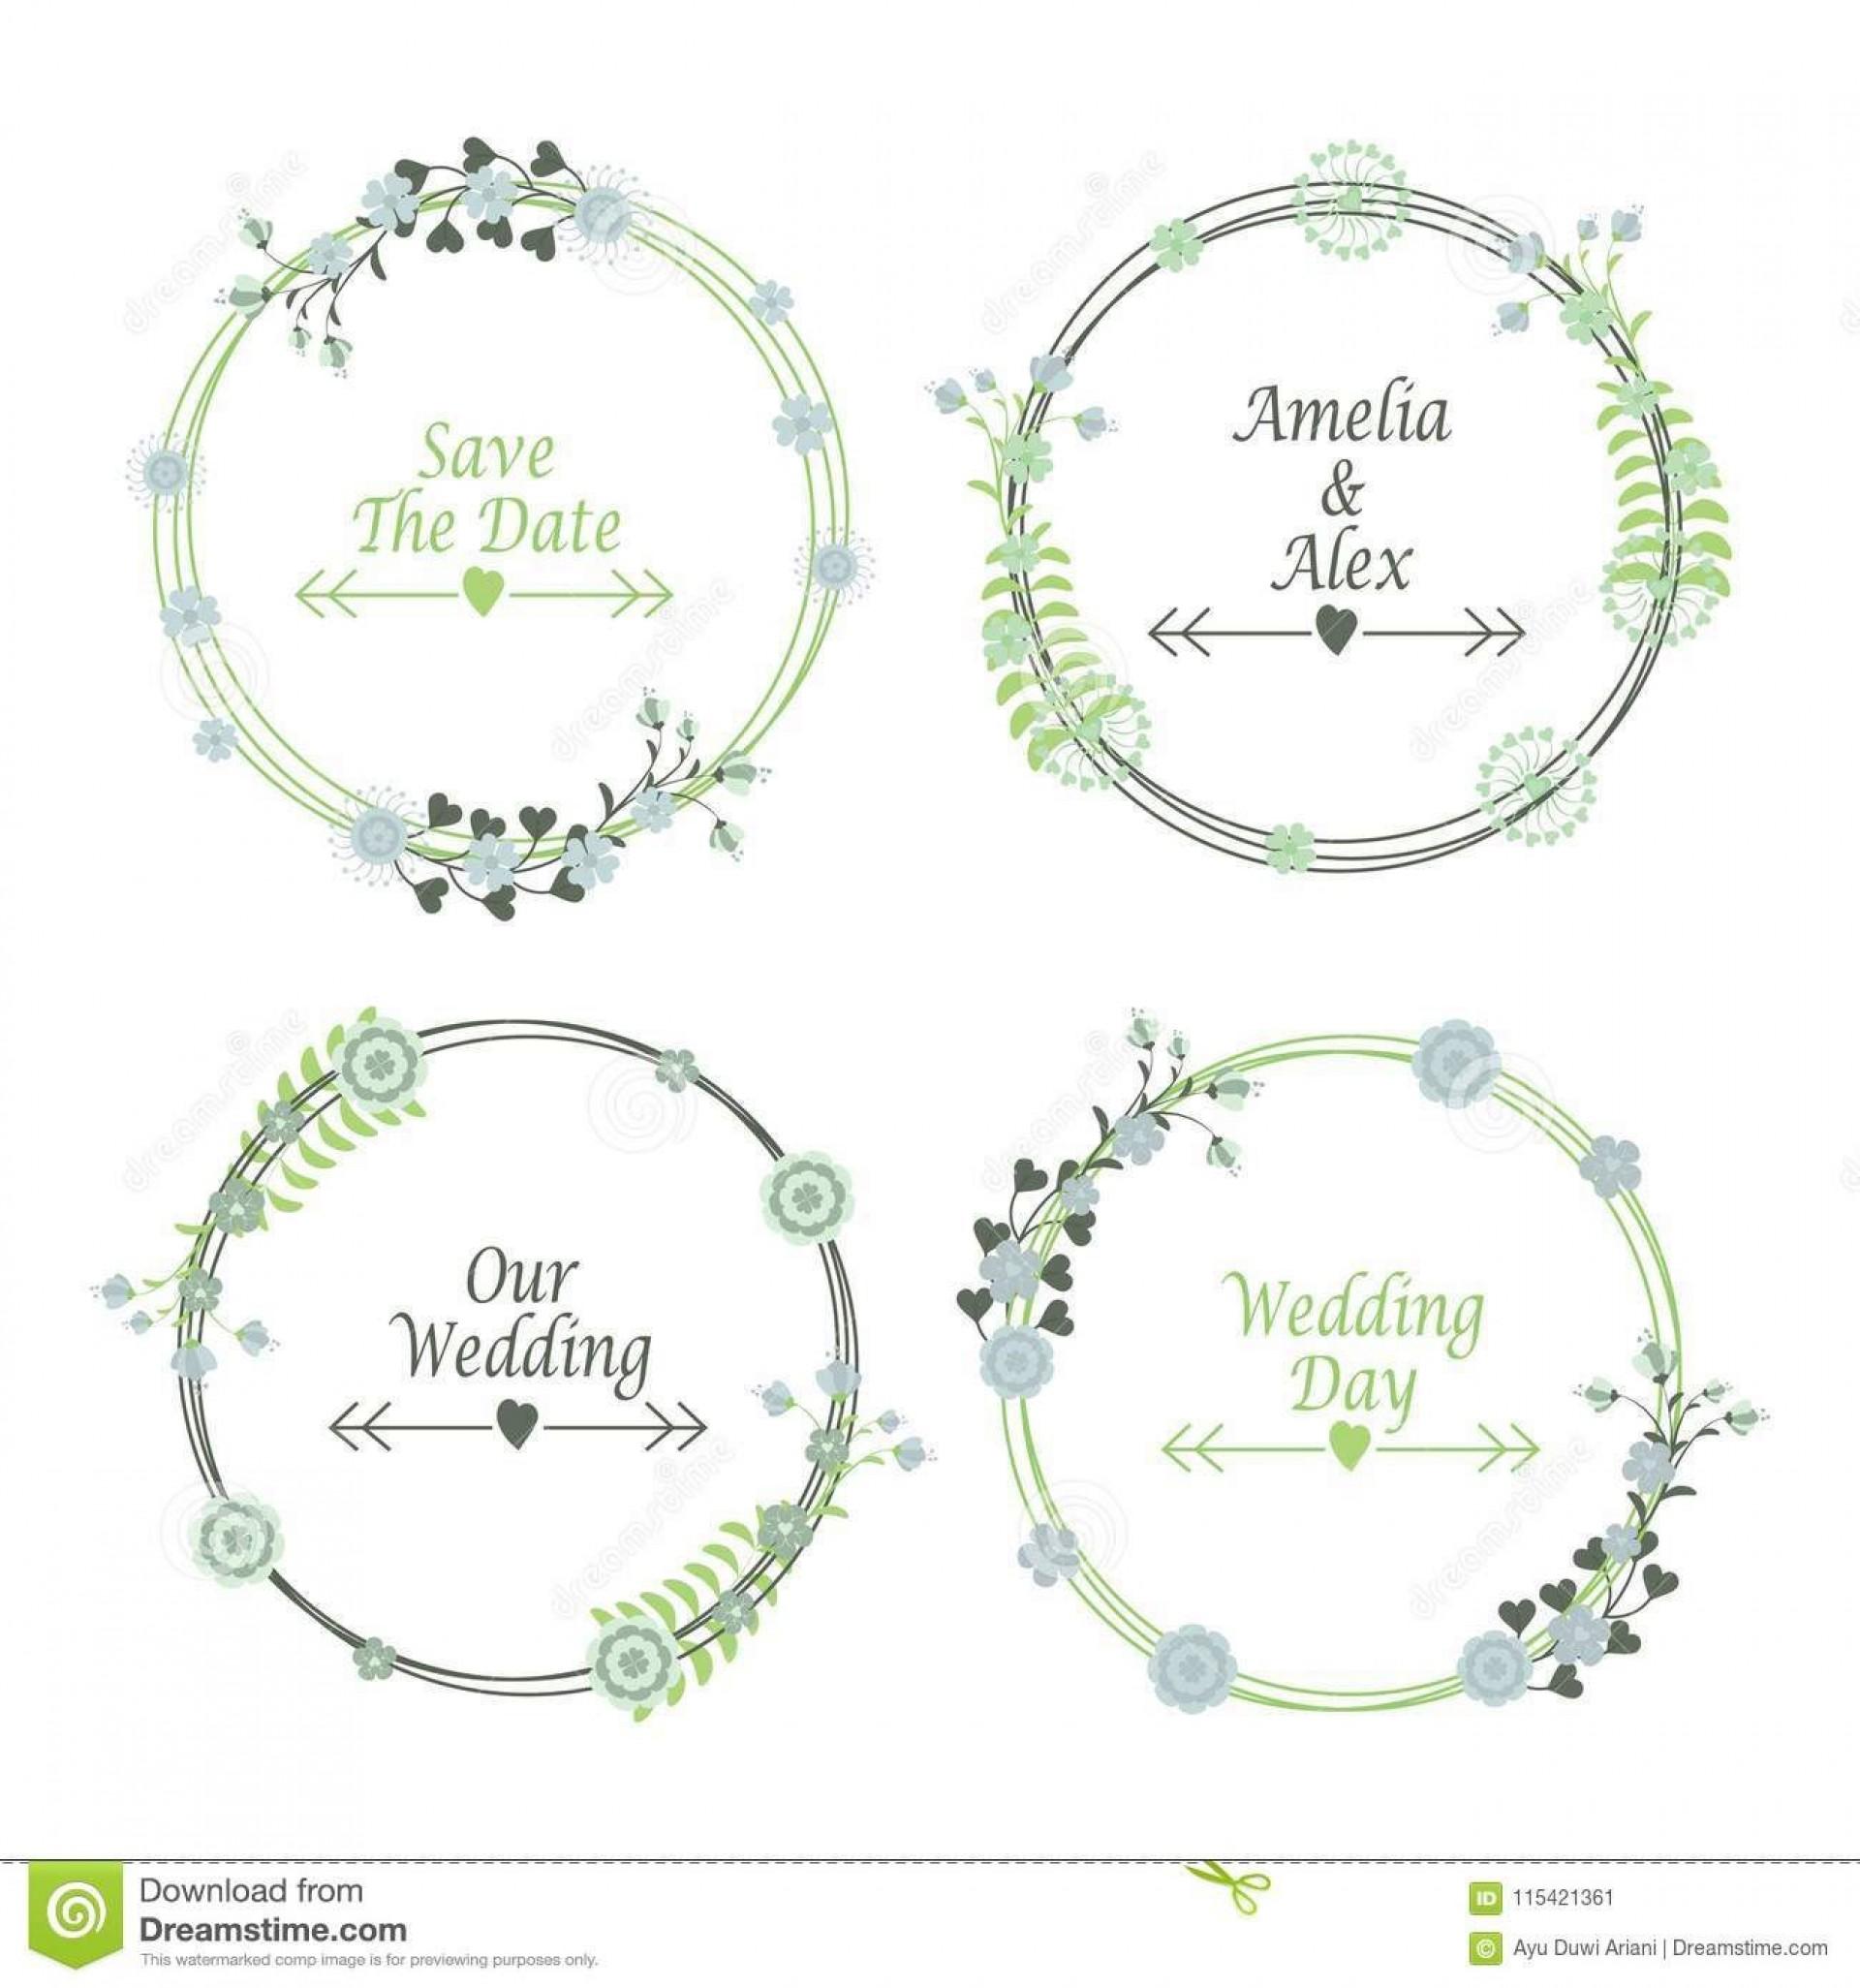 003 Excellent Wedding Addres Label Template Design  Free Printable1920